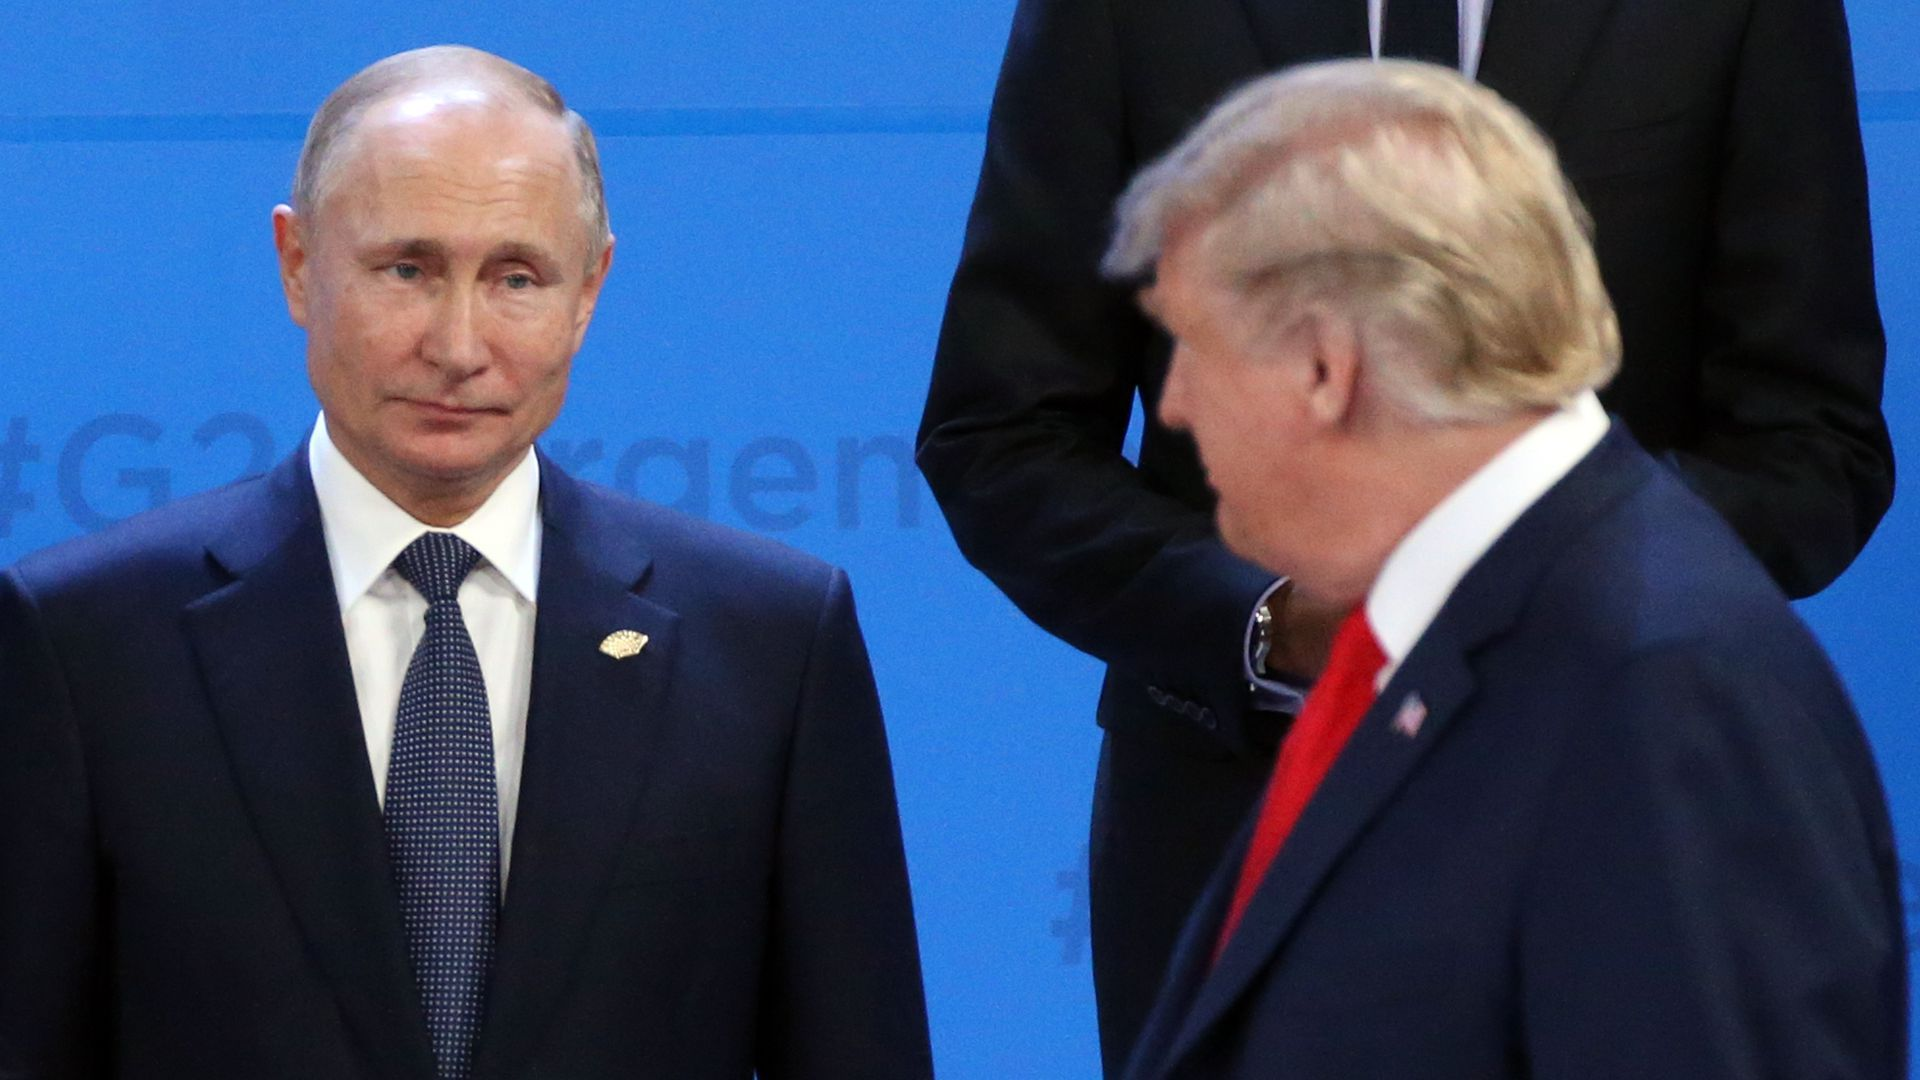 Putin on the left looks at Trump